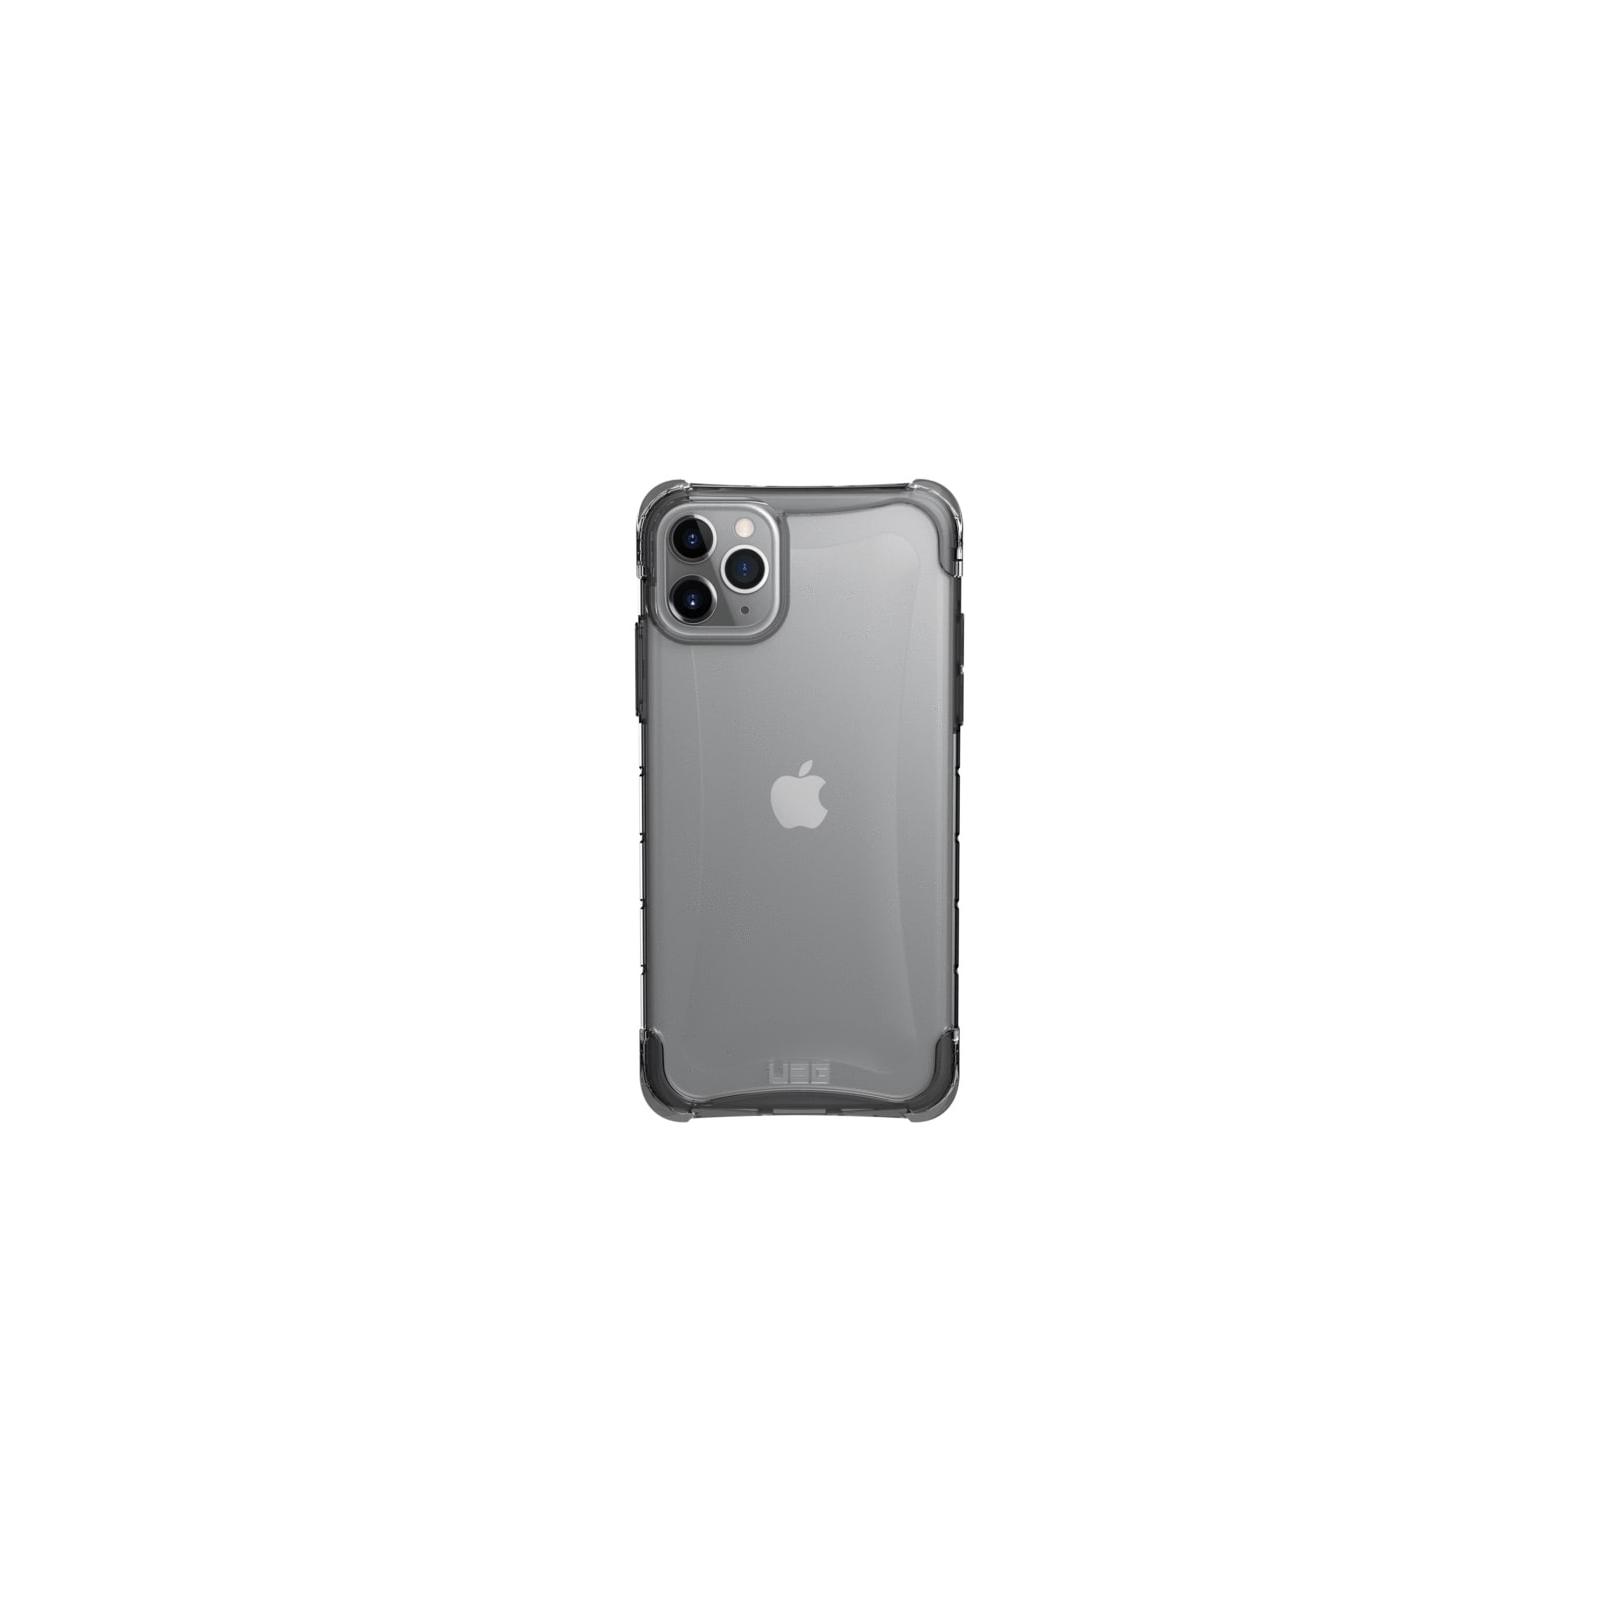 Чехол для моб. телефона Uag iPhone 11 Pro Max Plyo, Ice (111722114343)